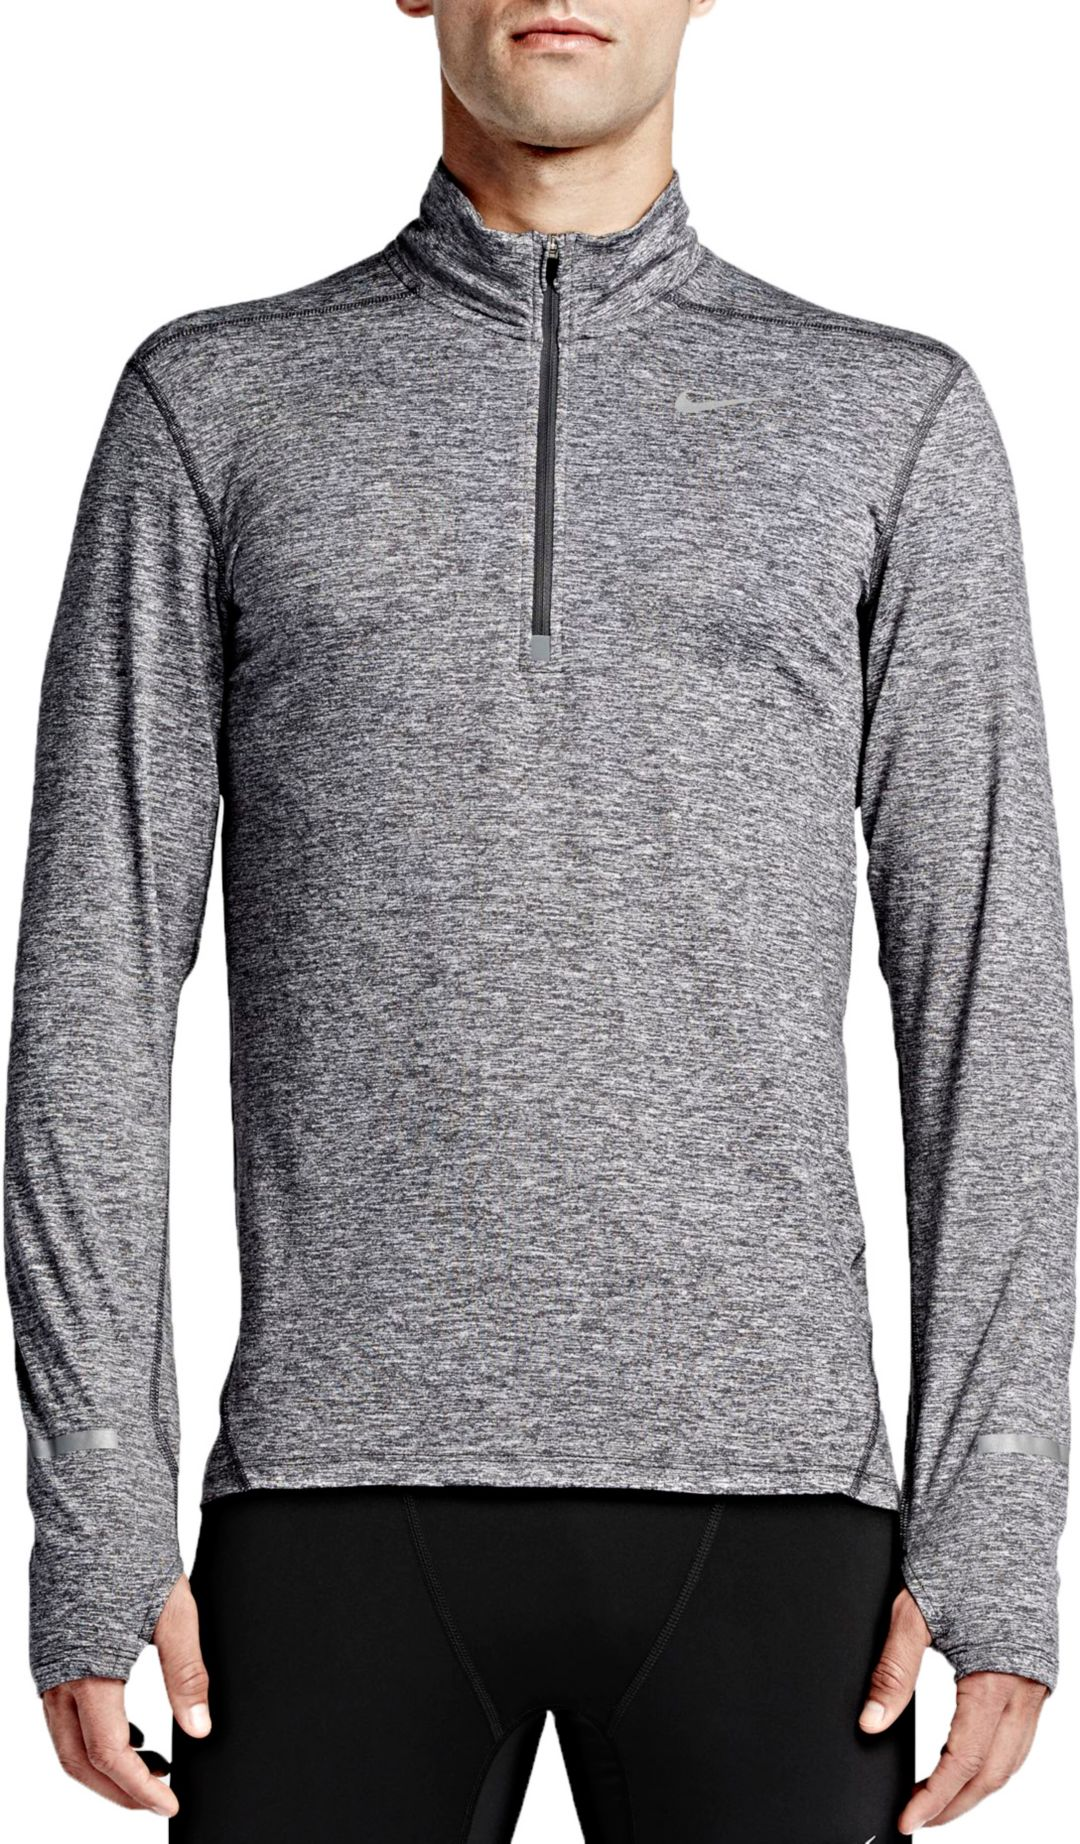 1db95daca Nike Men's Dri-FIT Half-Zip Running Shirt | DICK'S Sporting Goods